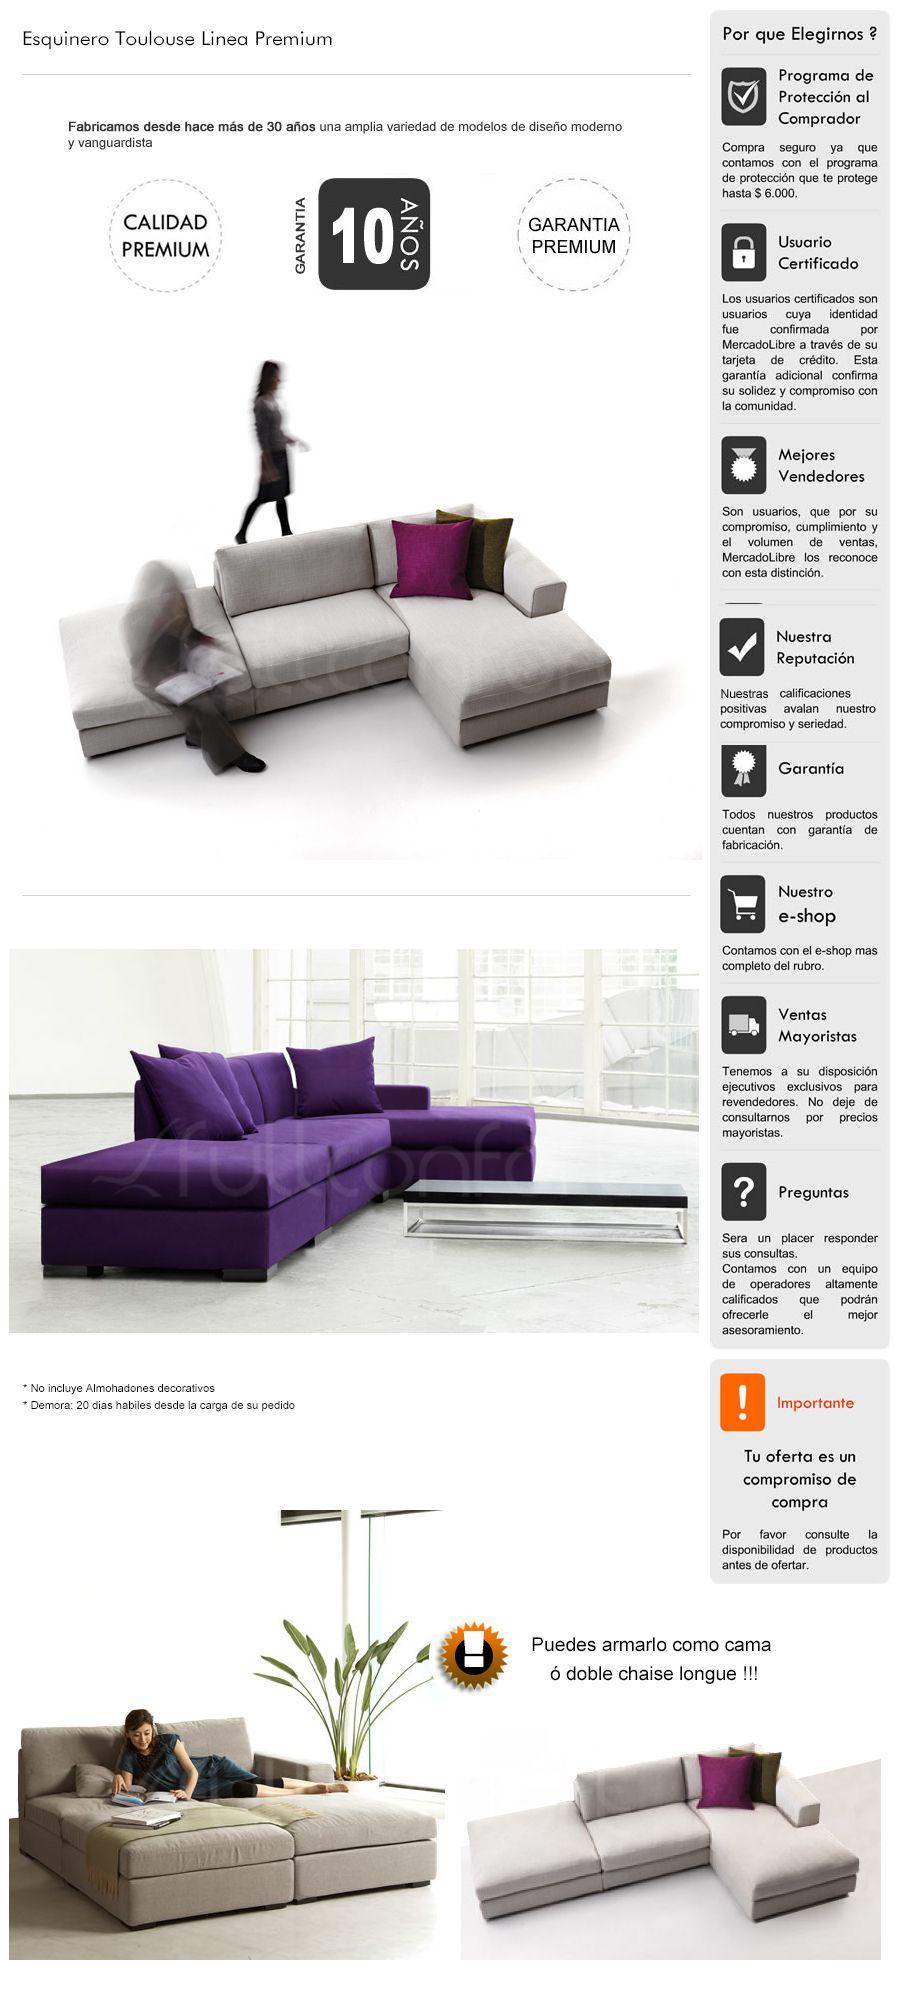 Sillon Sofa Esquinero Premium Convertible Cama Living